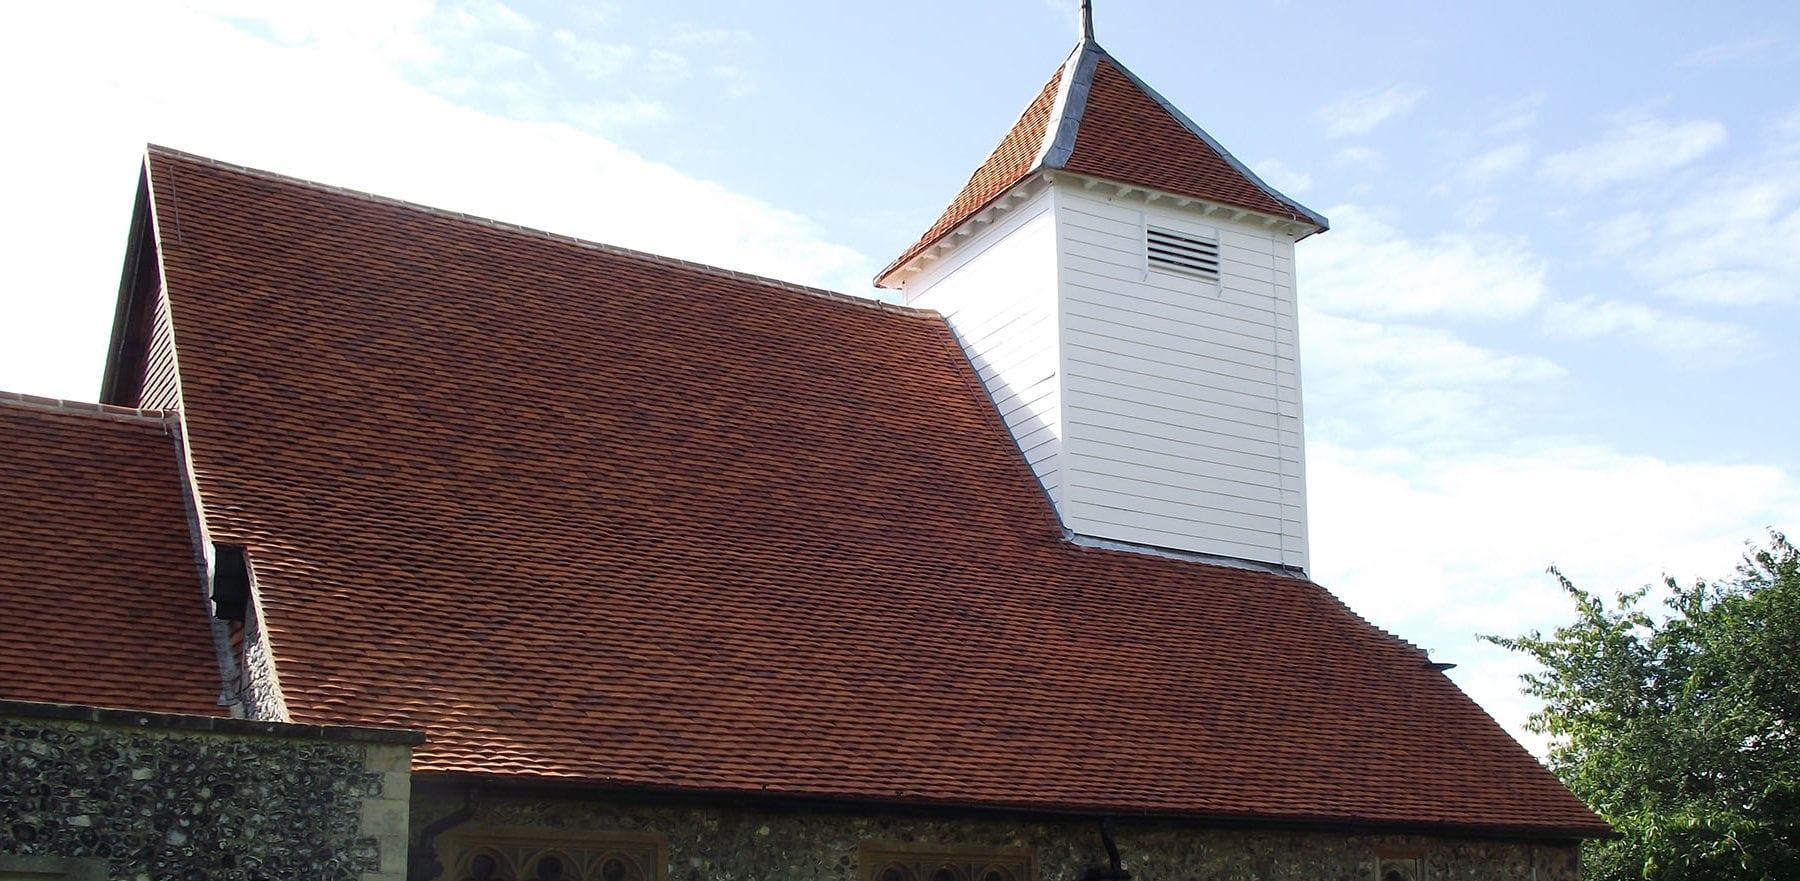 Lifestiles - Handmade Orange Clay Roof Tiles - Sulhampstead Abbot, England 3